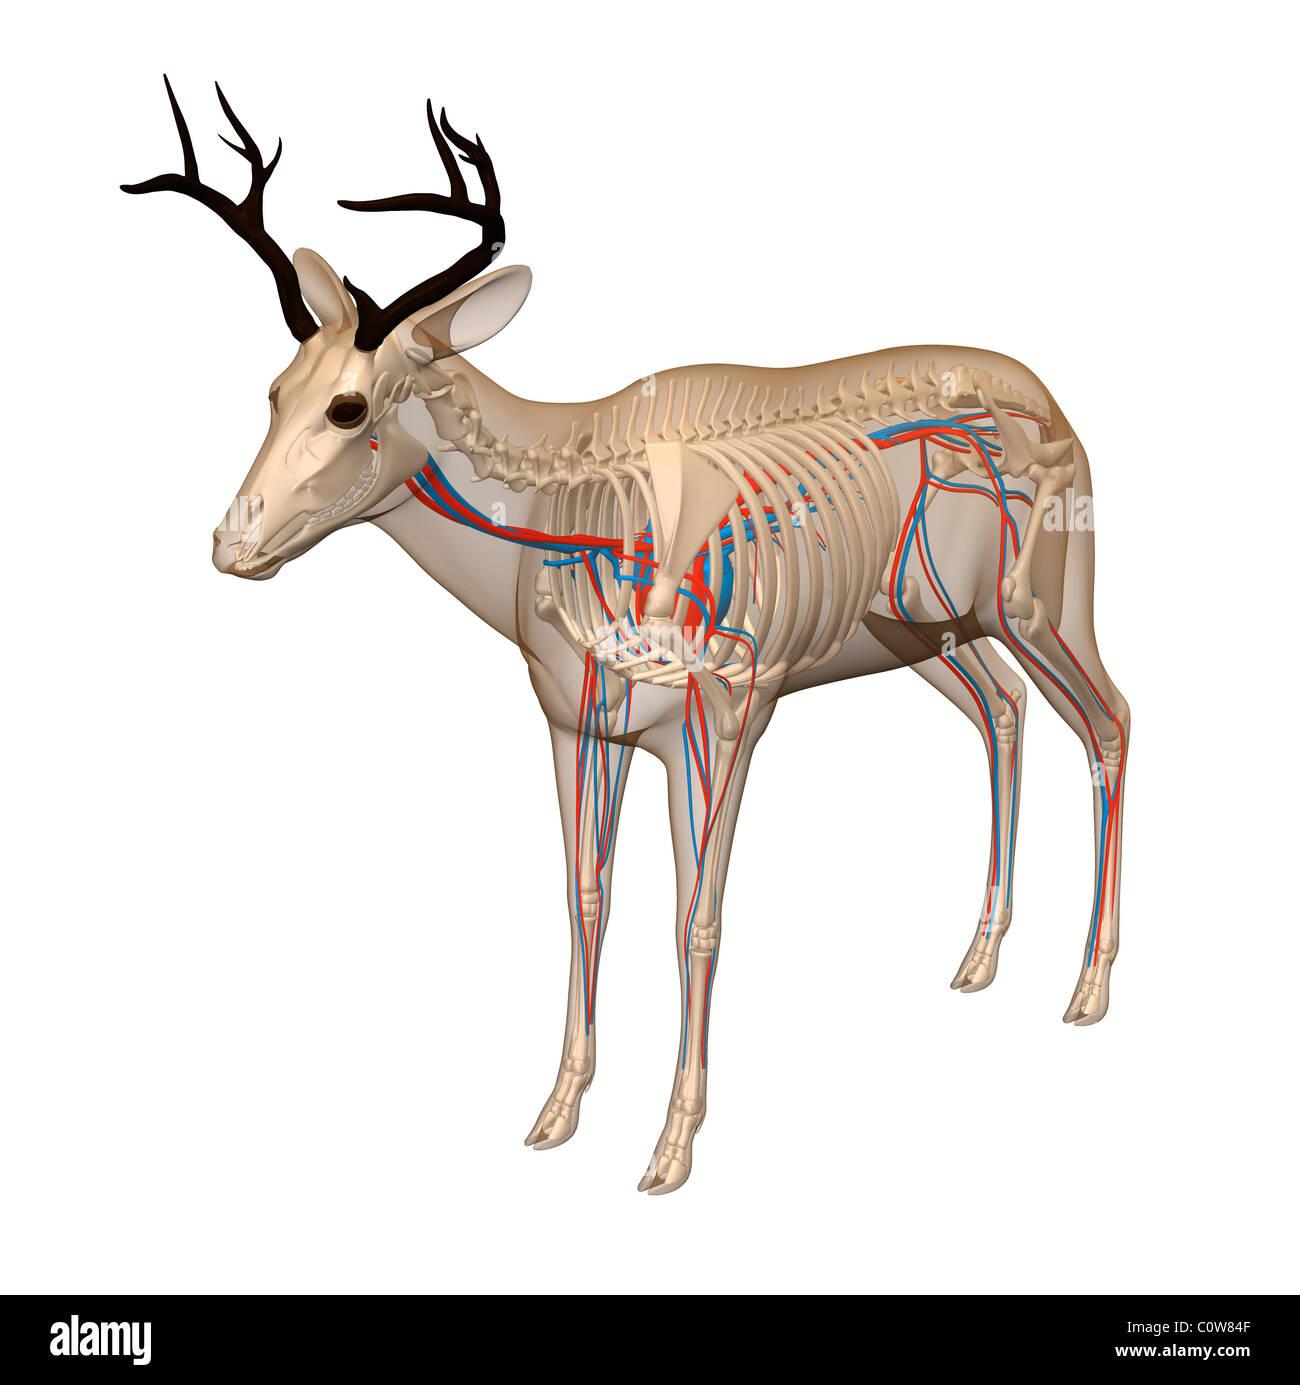 deer skeleton diagram switch wiring ceiling fan anatomy heart circulation transparent body